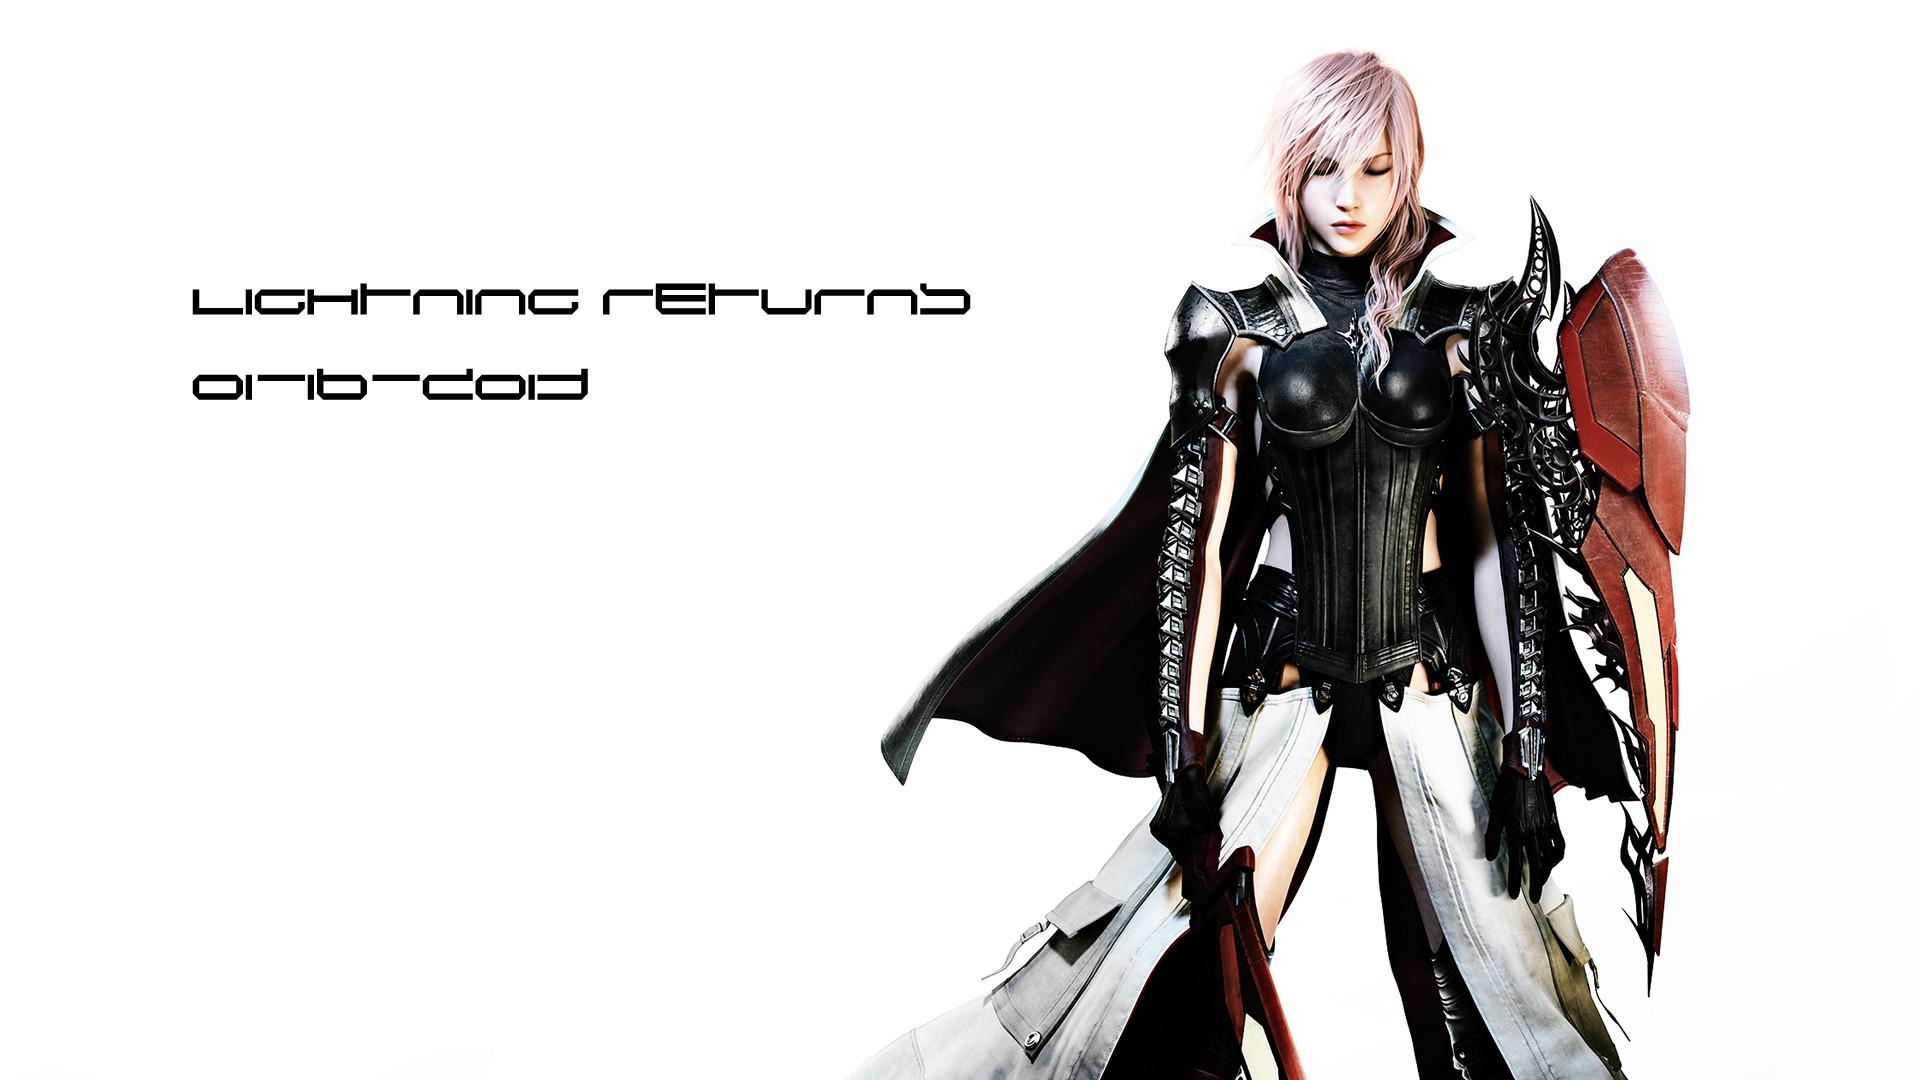 … Lightning Returns (big) – Final Fantasy XIII by kimcheolho